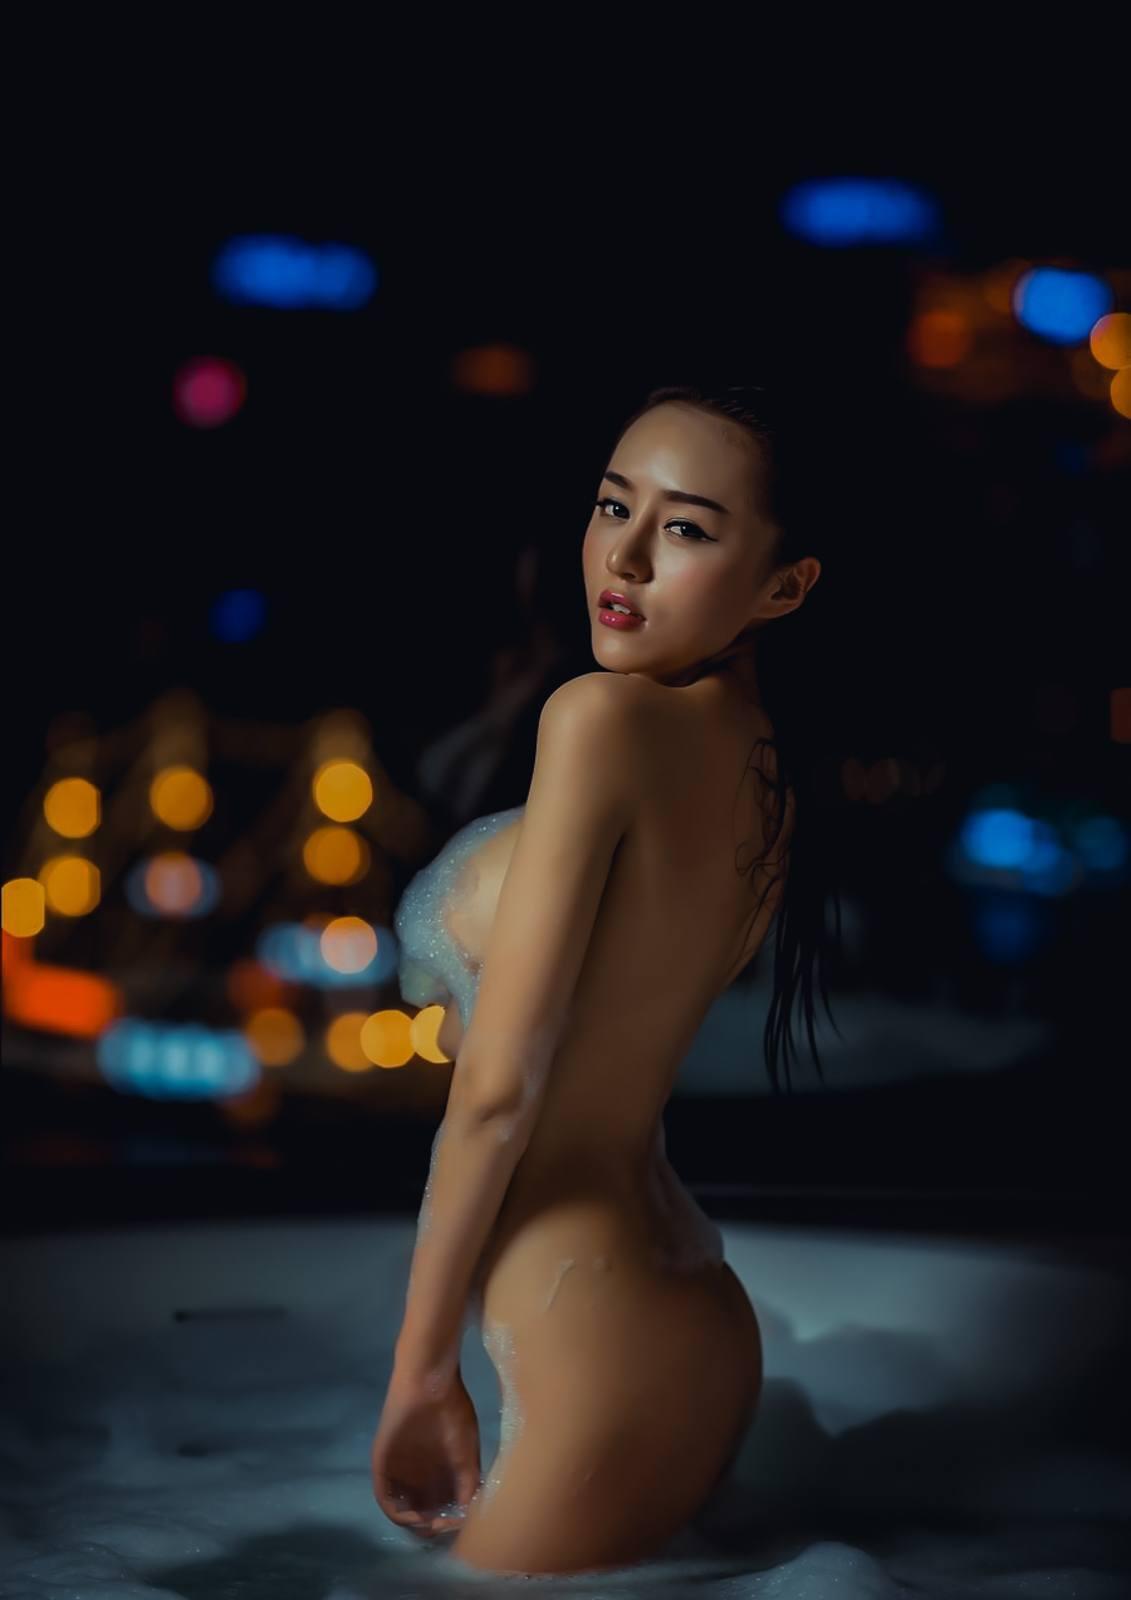 20141219212118291 42284152 - Korean Nude - Big Albom Remain #A-korean girl